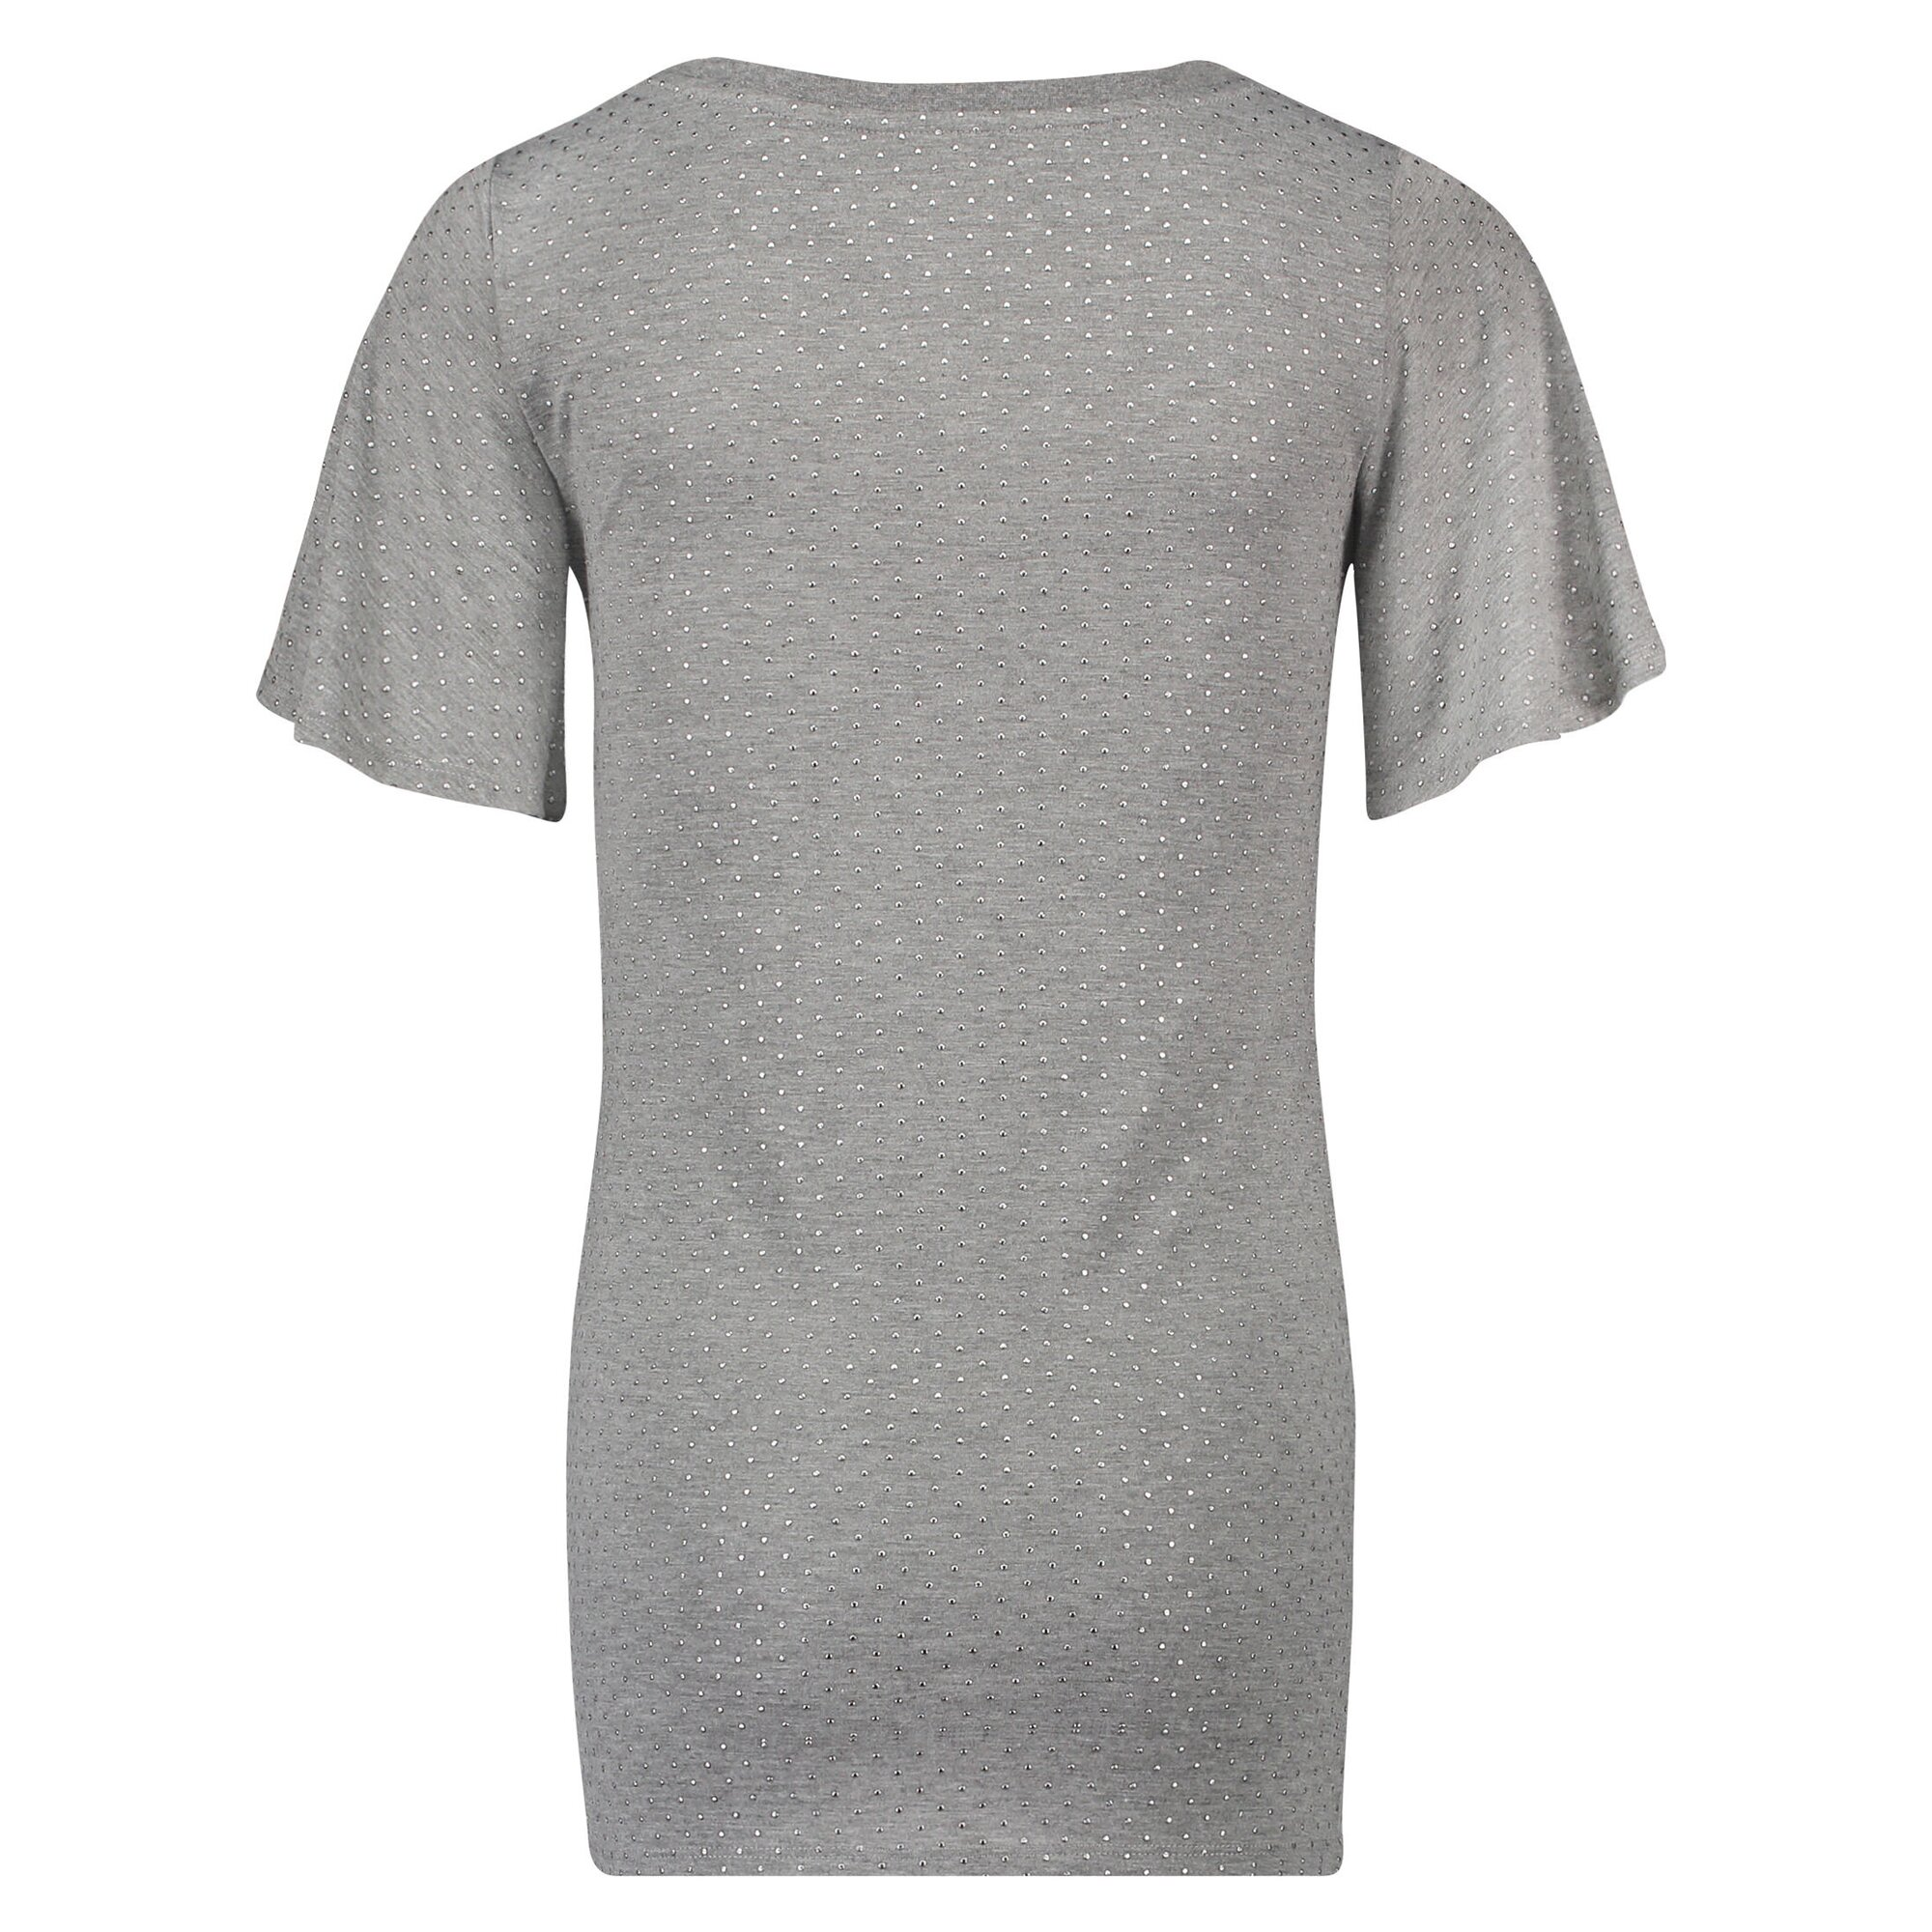 noppies-t-shirt-aaf, 39.99 EUR @ babywalz-de